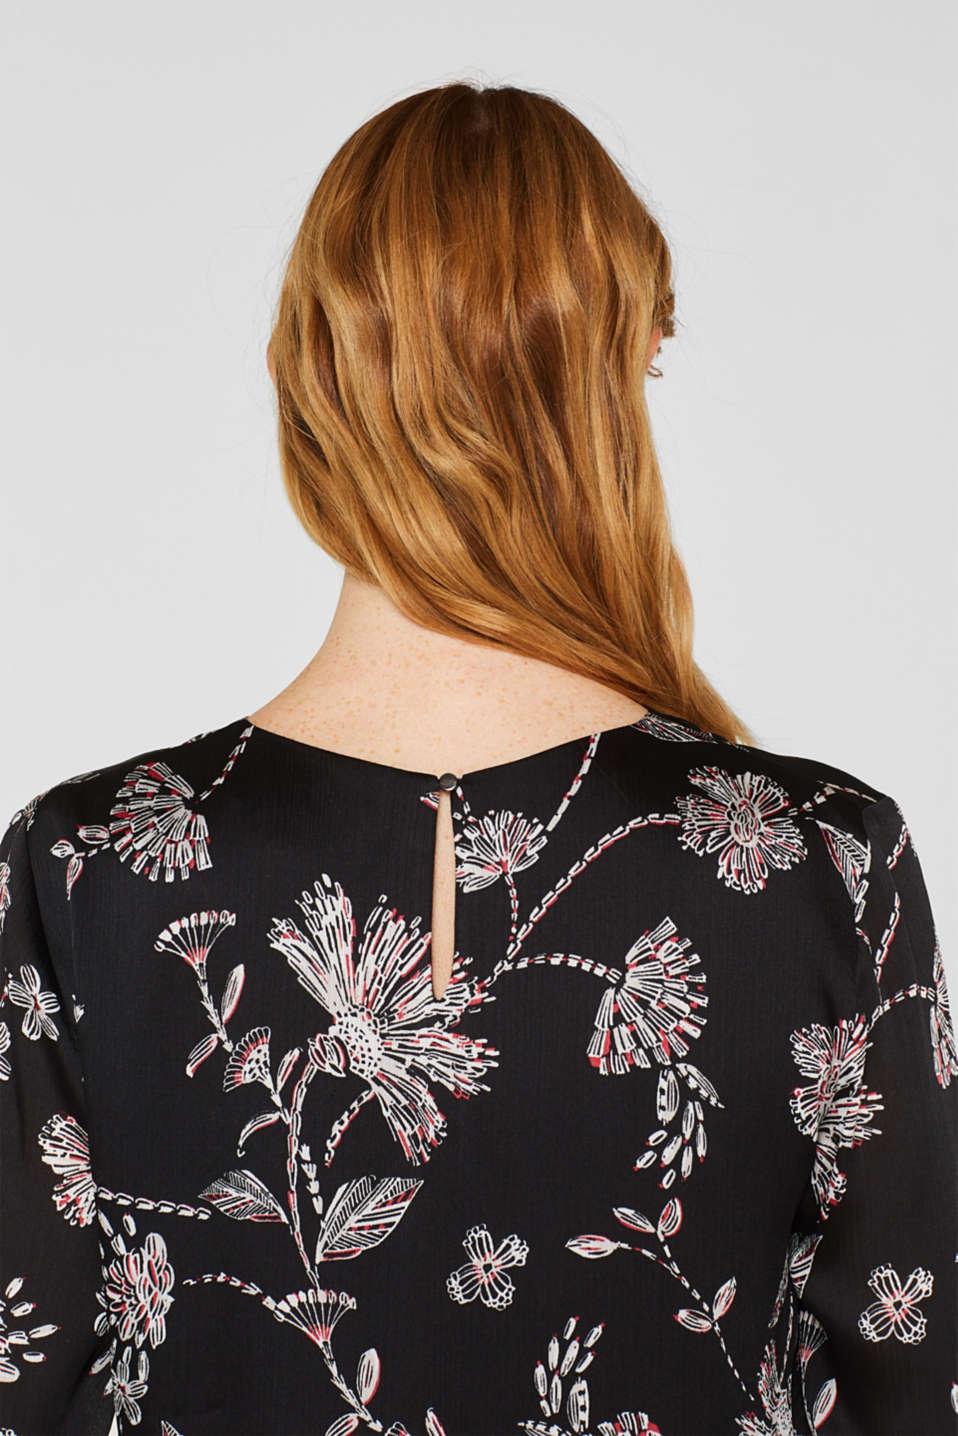 Satin crinkled blouse with a smocked detail, BLACK, detail image number 5